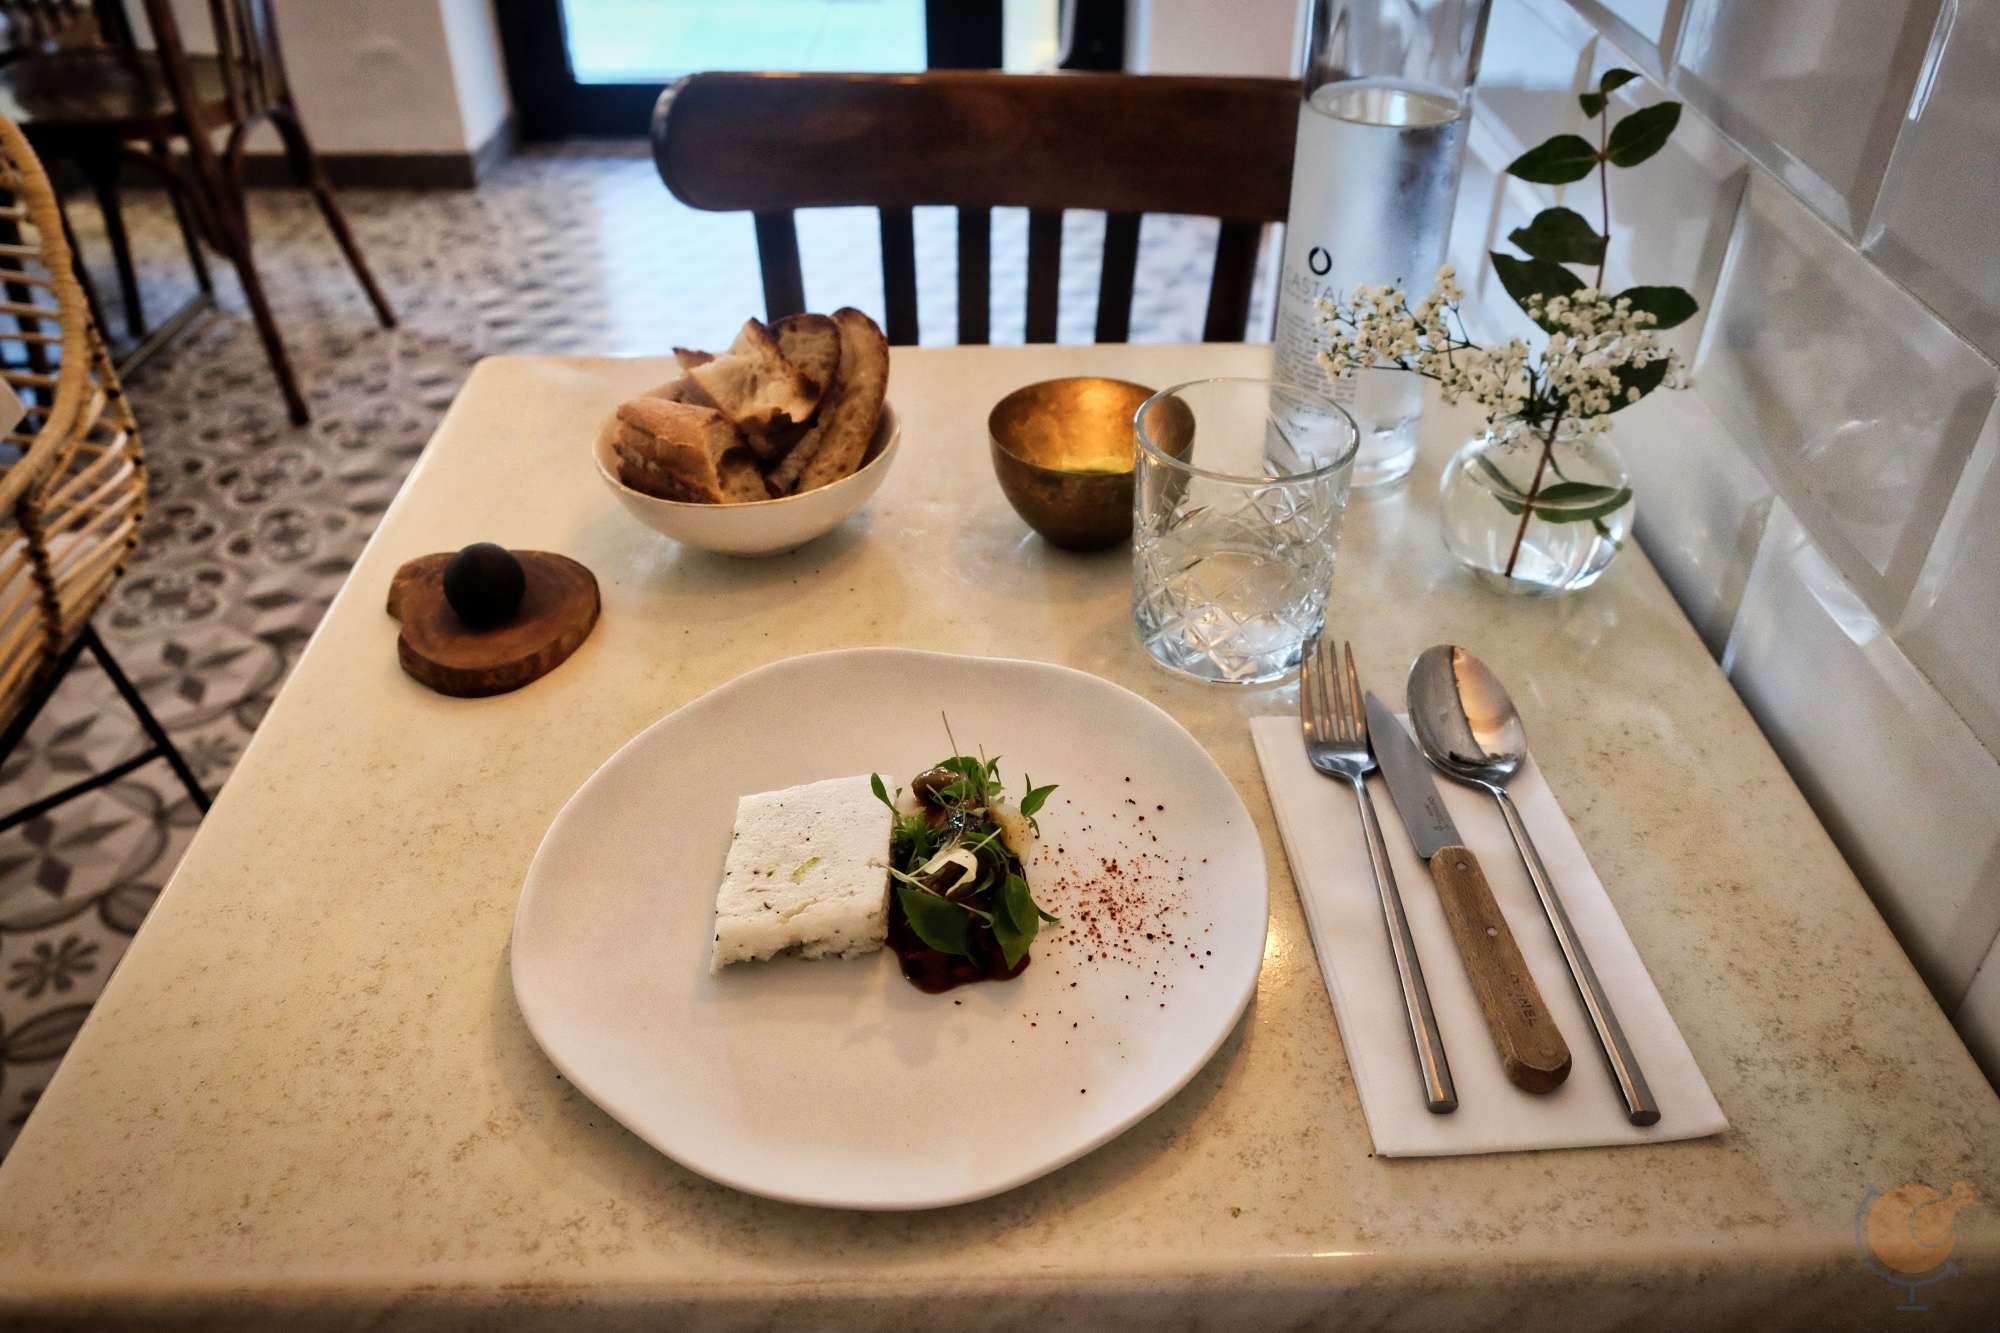 dscf1370_les_agitateurs_restaurant_france_nice_nizza_vilagevo_jokuti_andras_l_w.jpg